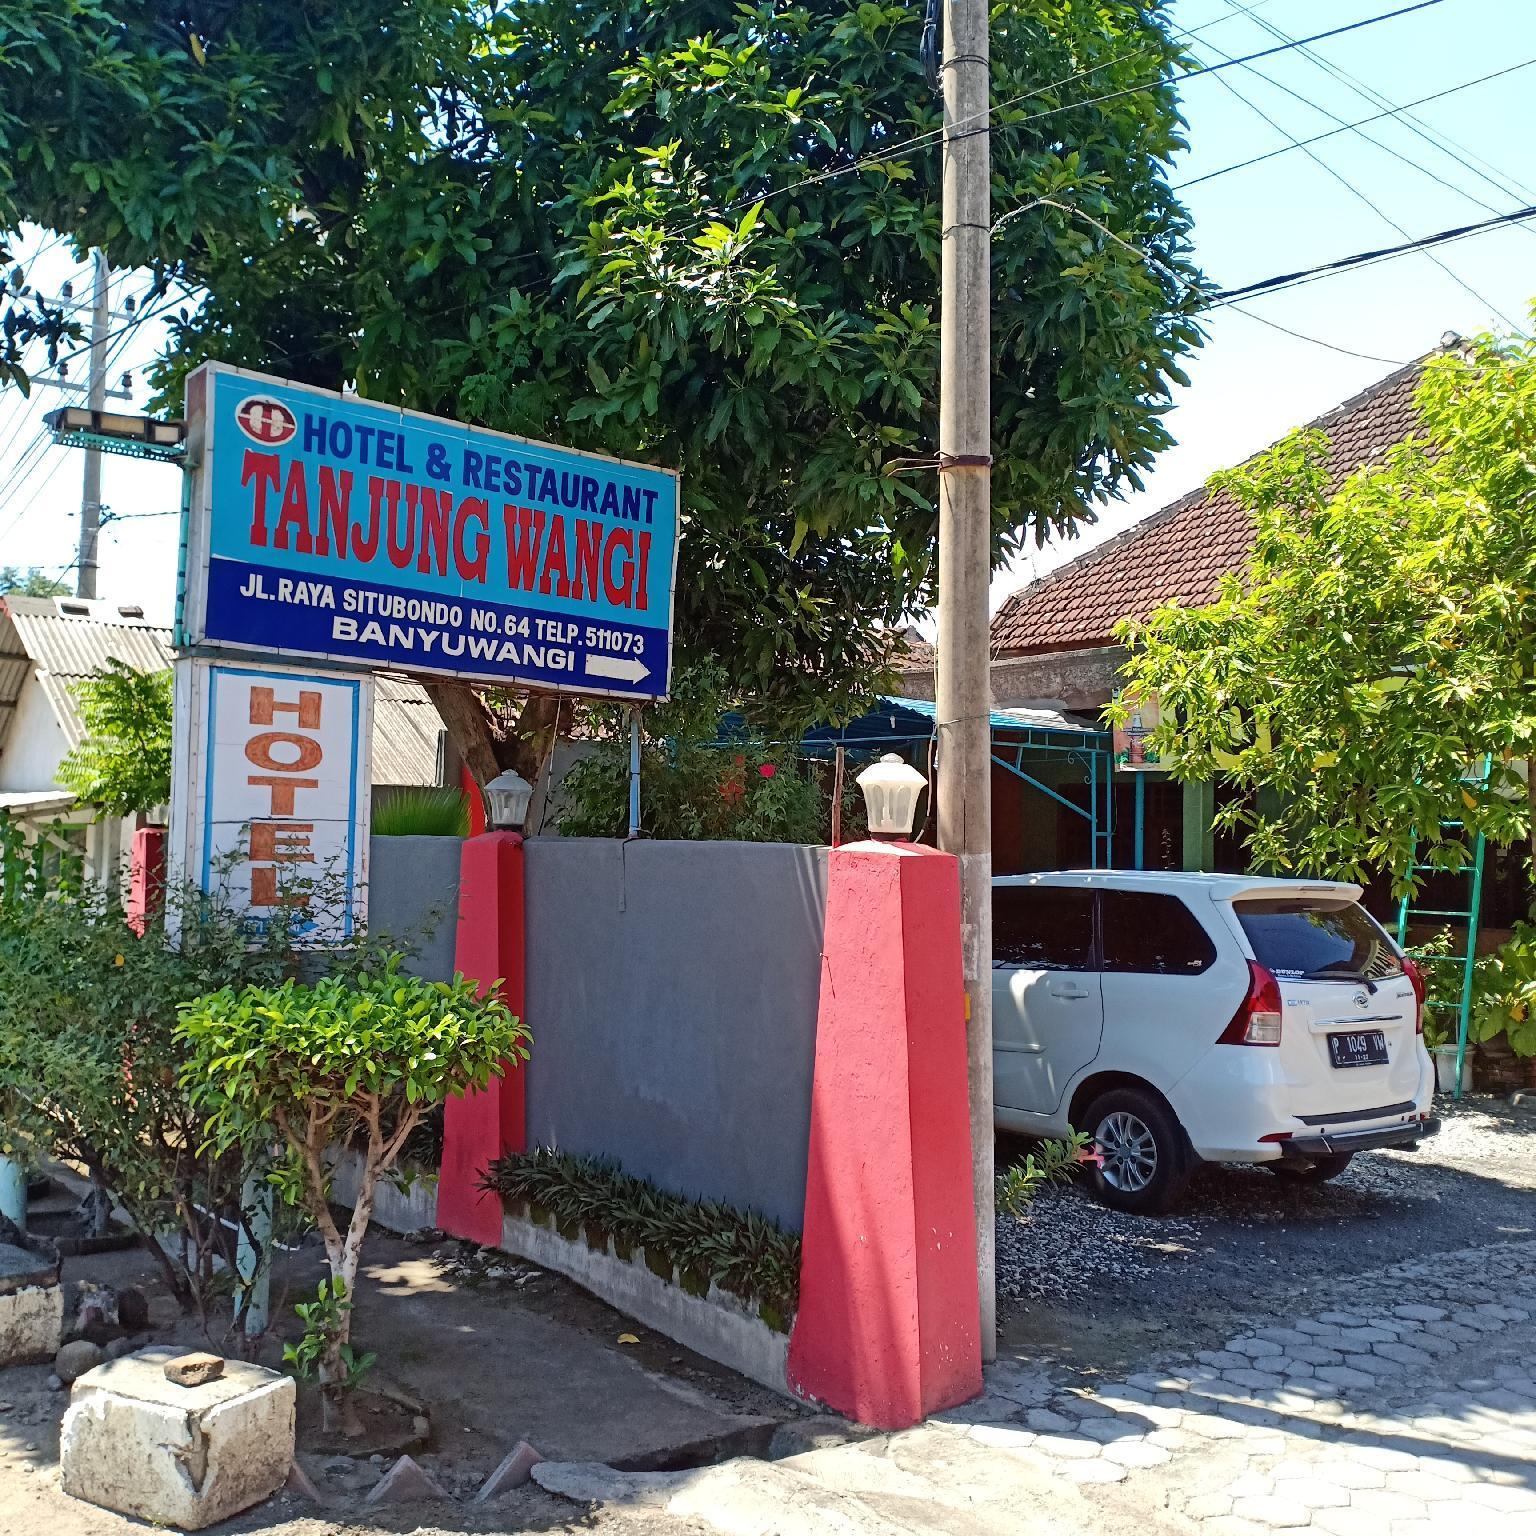 Hotel Tanjung Wangi